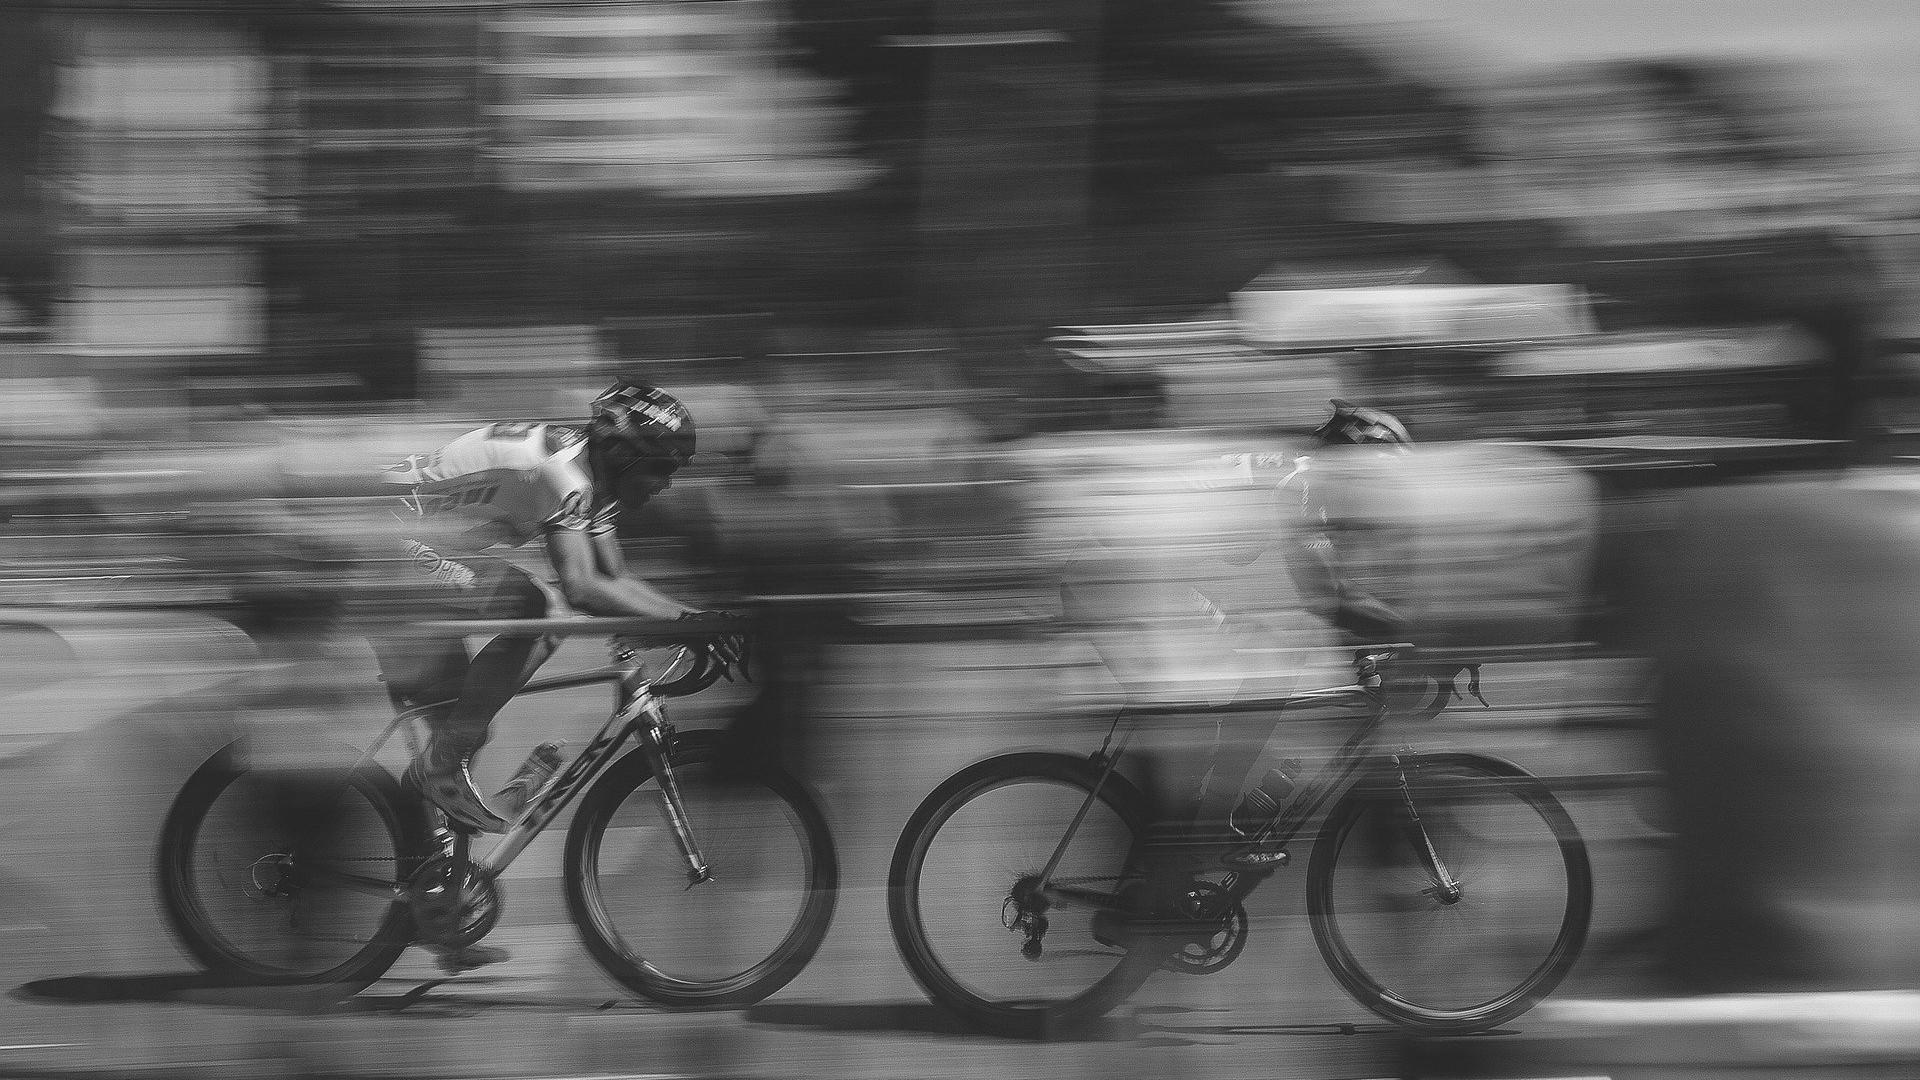 bike-riding-1149234_1920